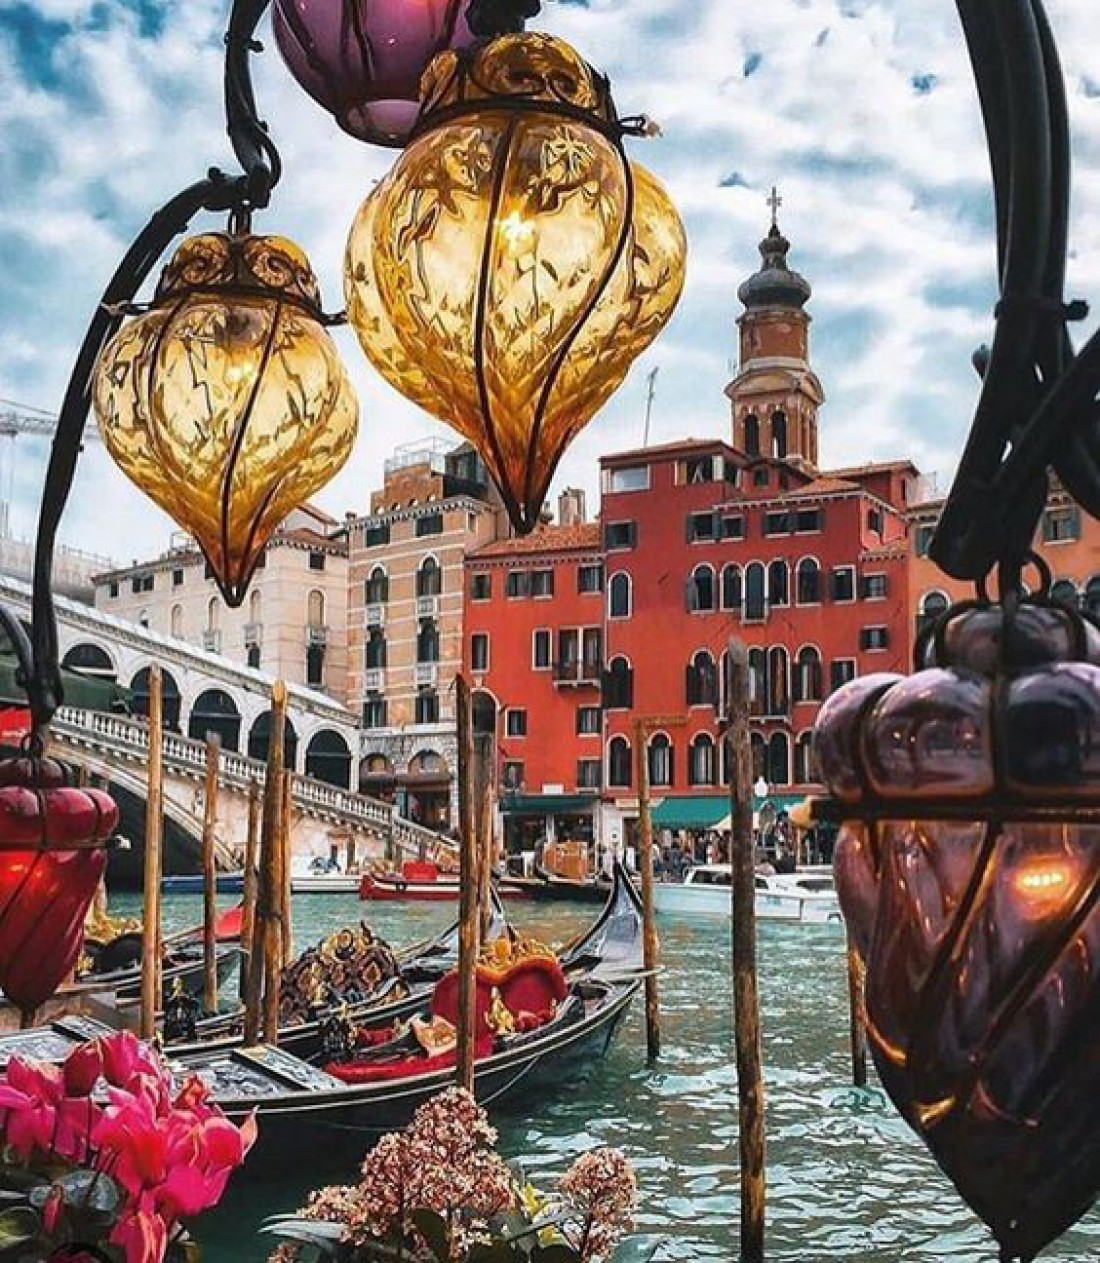 Венеция погрузит в атмосферу романтики даже самого закоренелого скептика